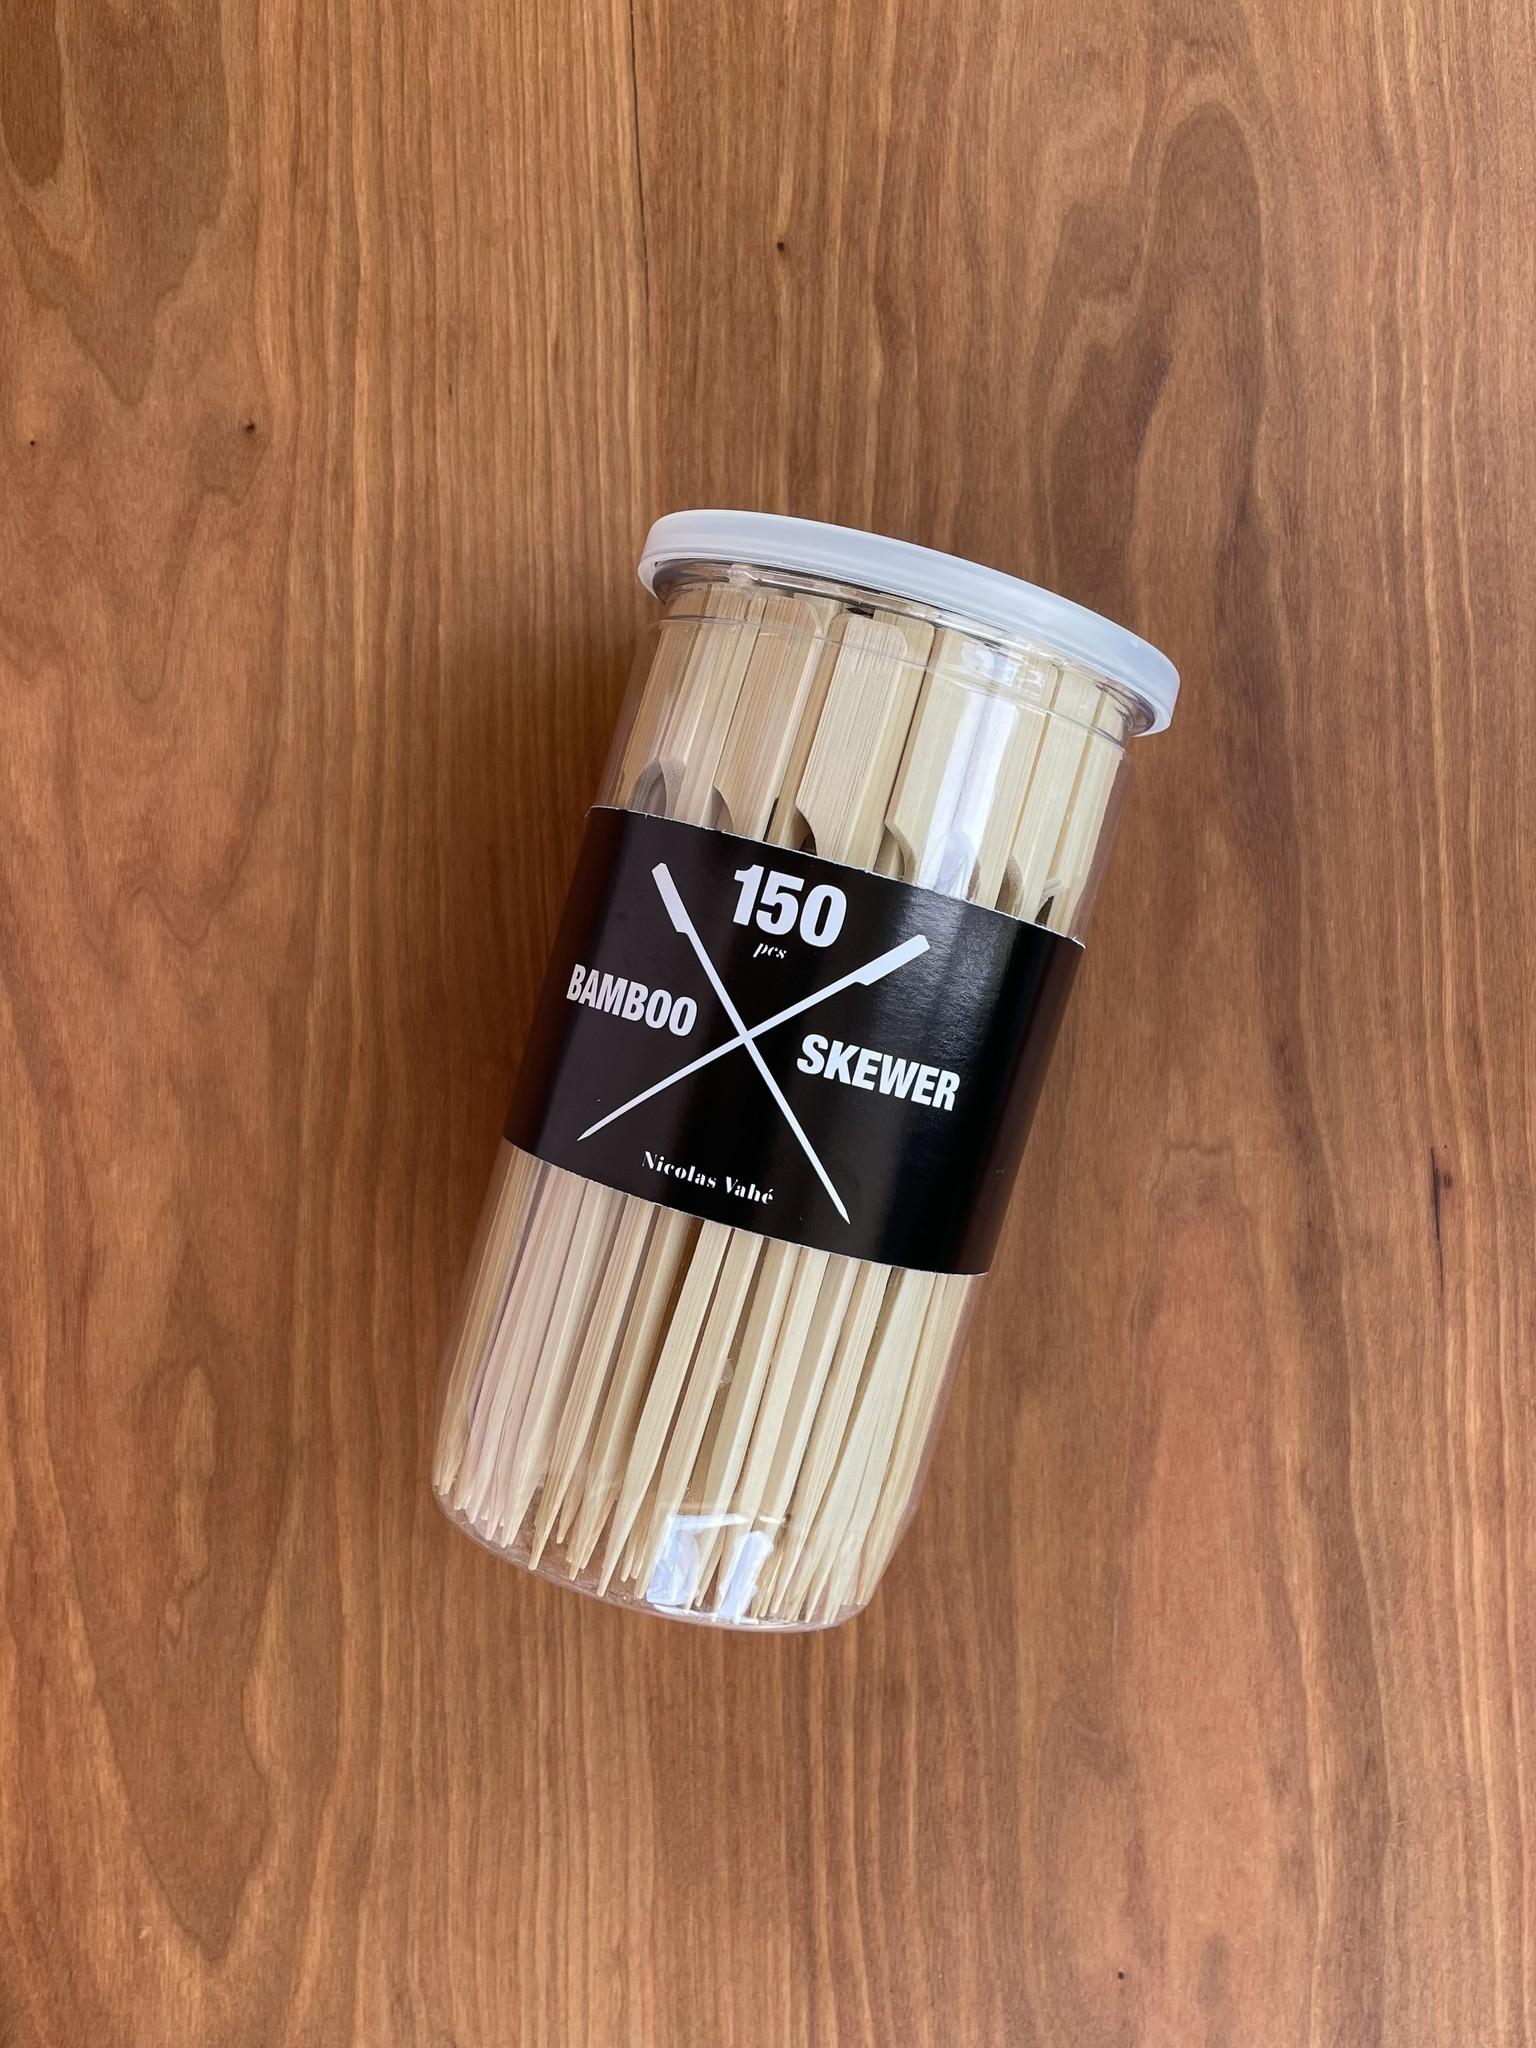 Nicolas Vahe Bamboo Skewers, 150 Pieces-1